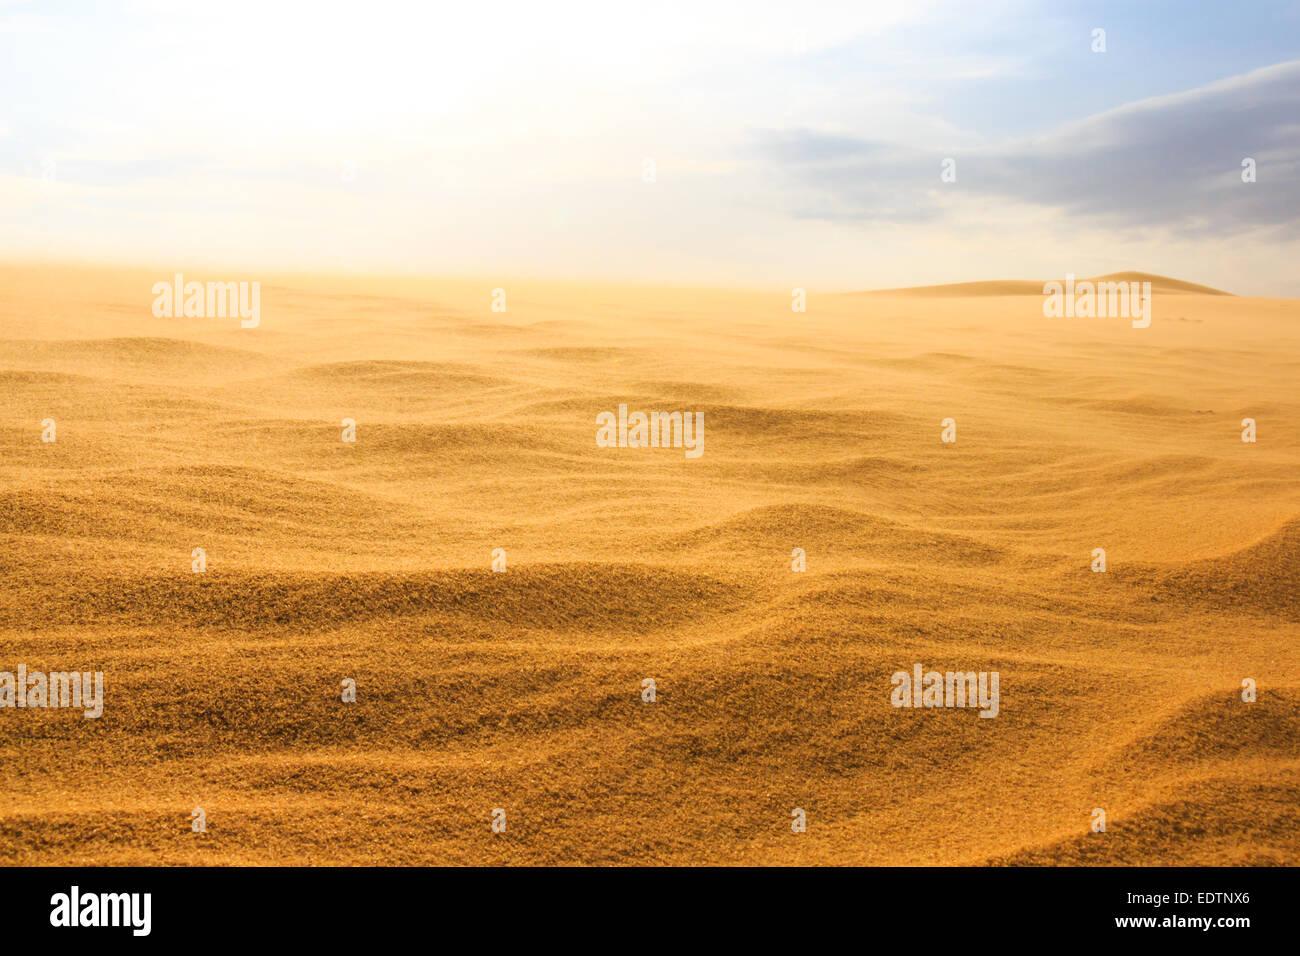 Wave on desert at Mui Ne, South Vietnam - Stock Image